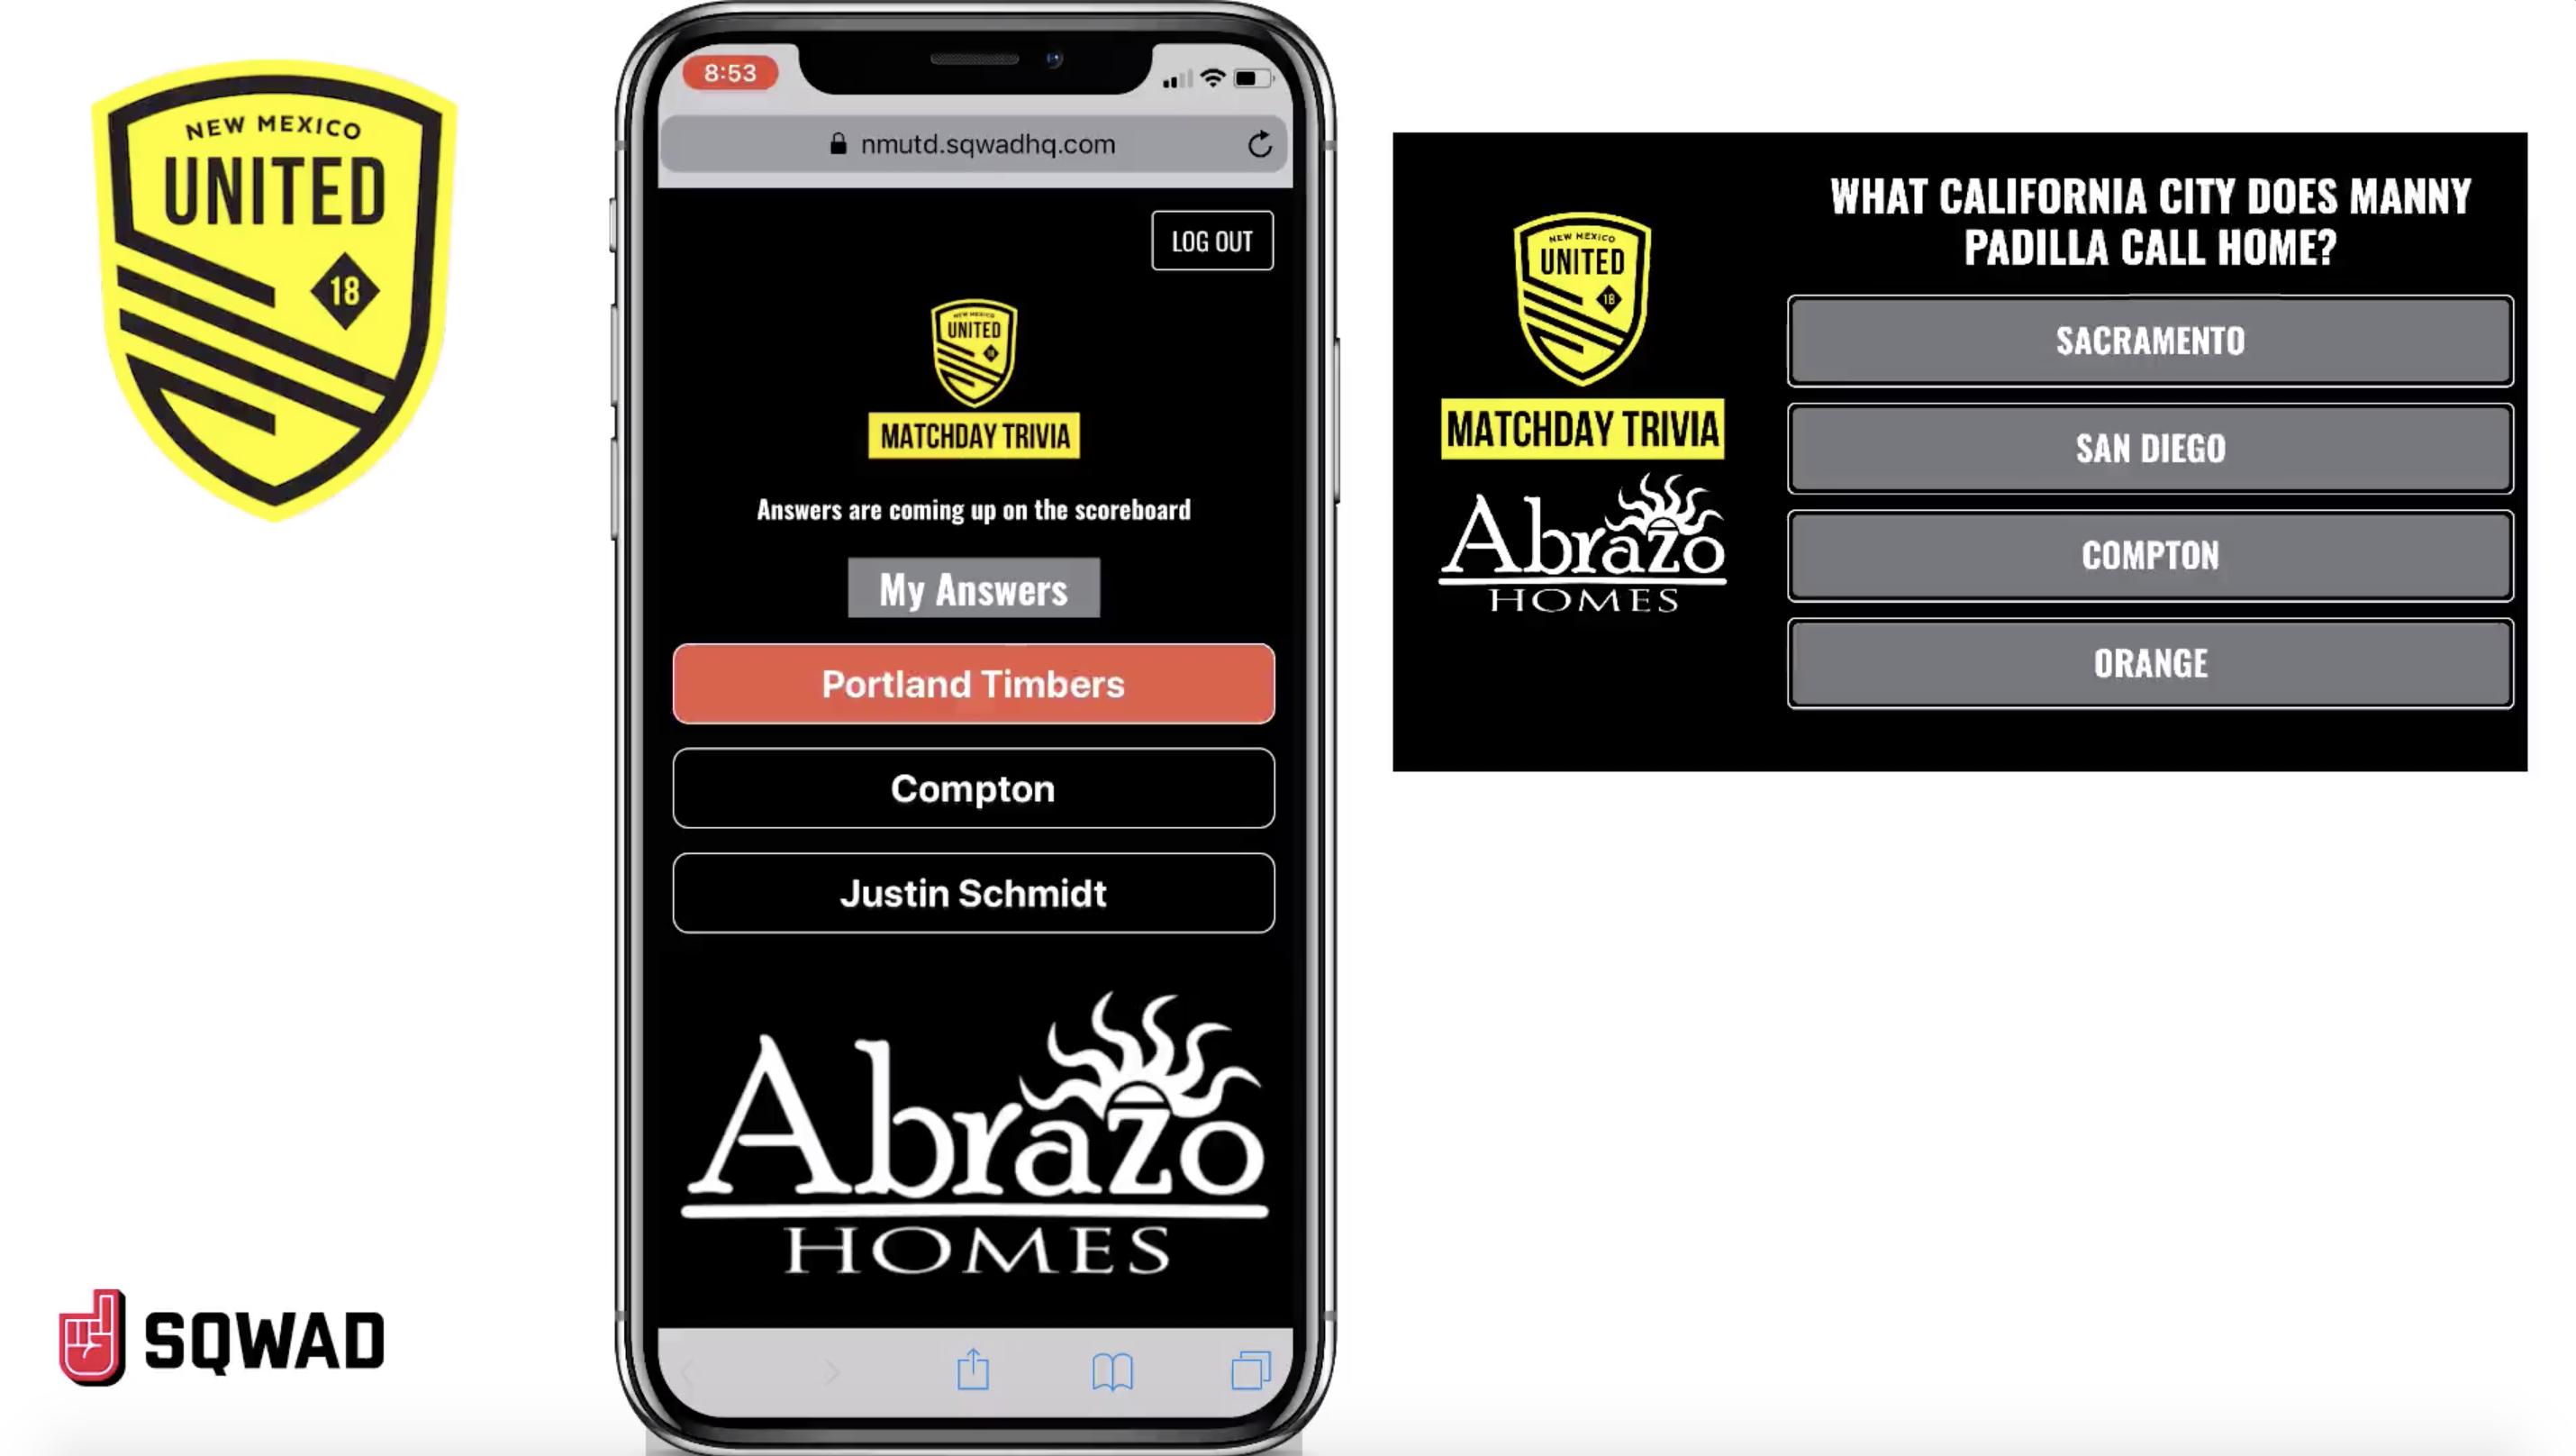 4852e323a New Mexico United Delivers Unique Digital Activation for Partner